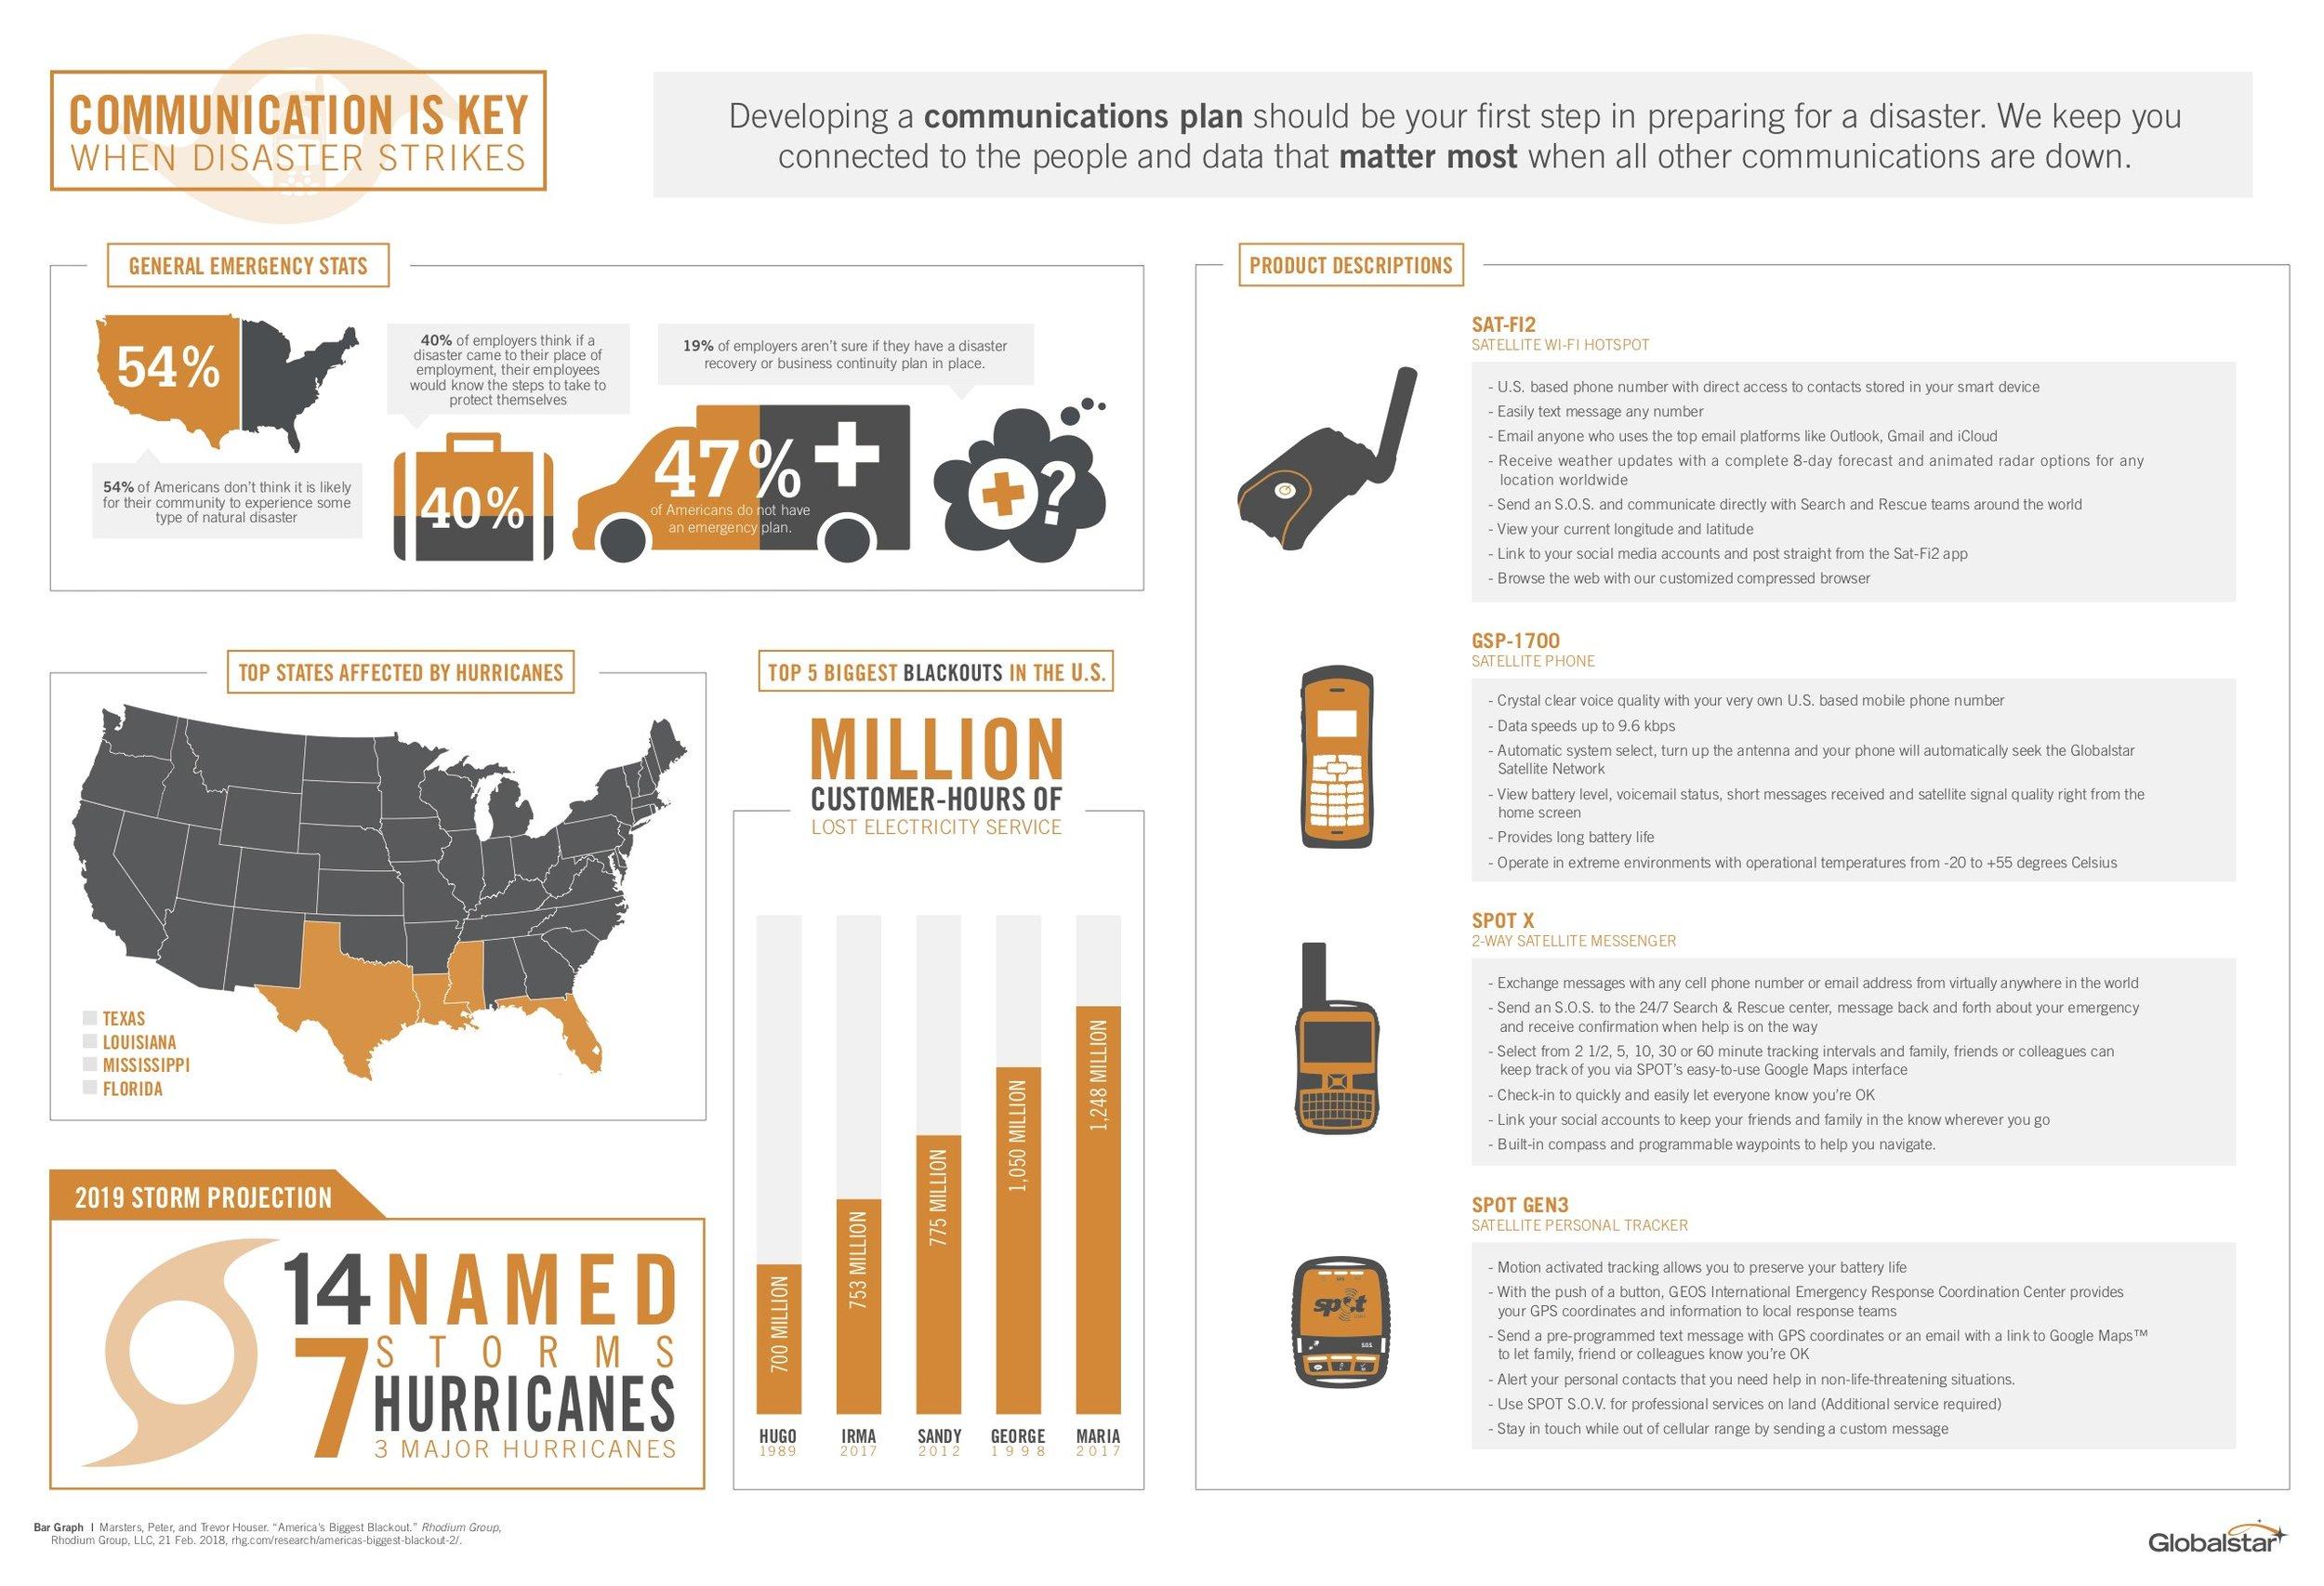 GLOB19_Hurricane_Infographic_Digital (2).jpg